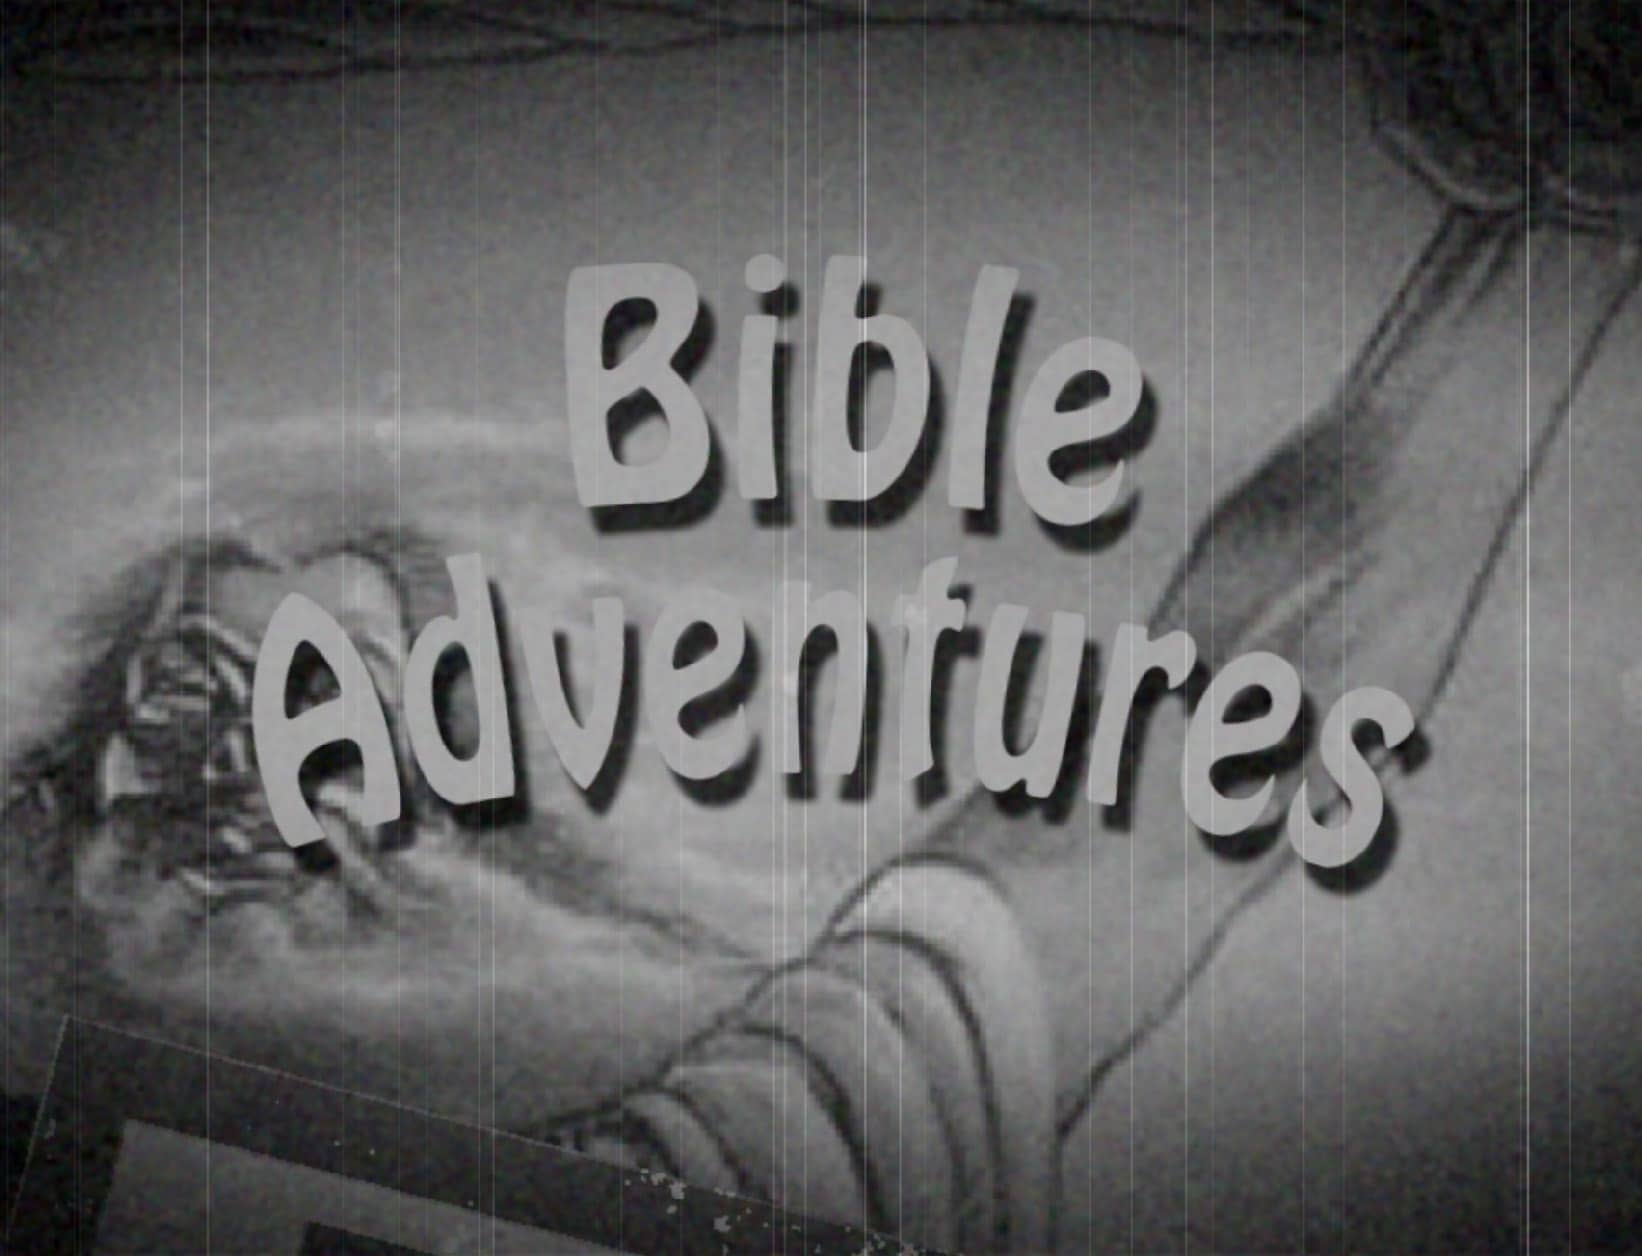 Bible Adventures (Sega MegaDrive, 1995)